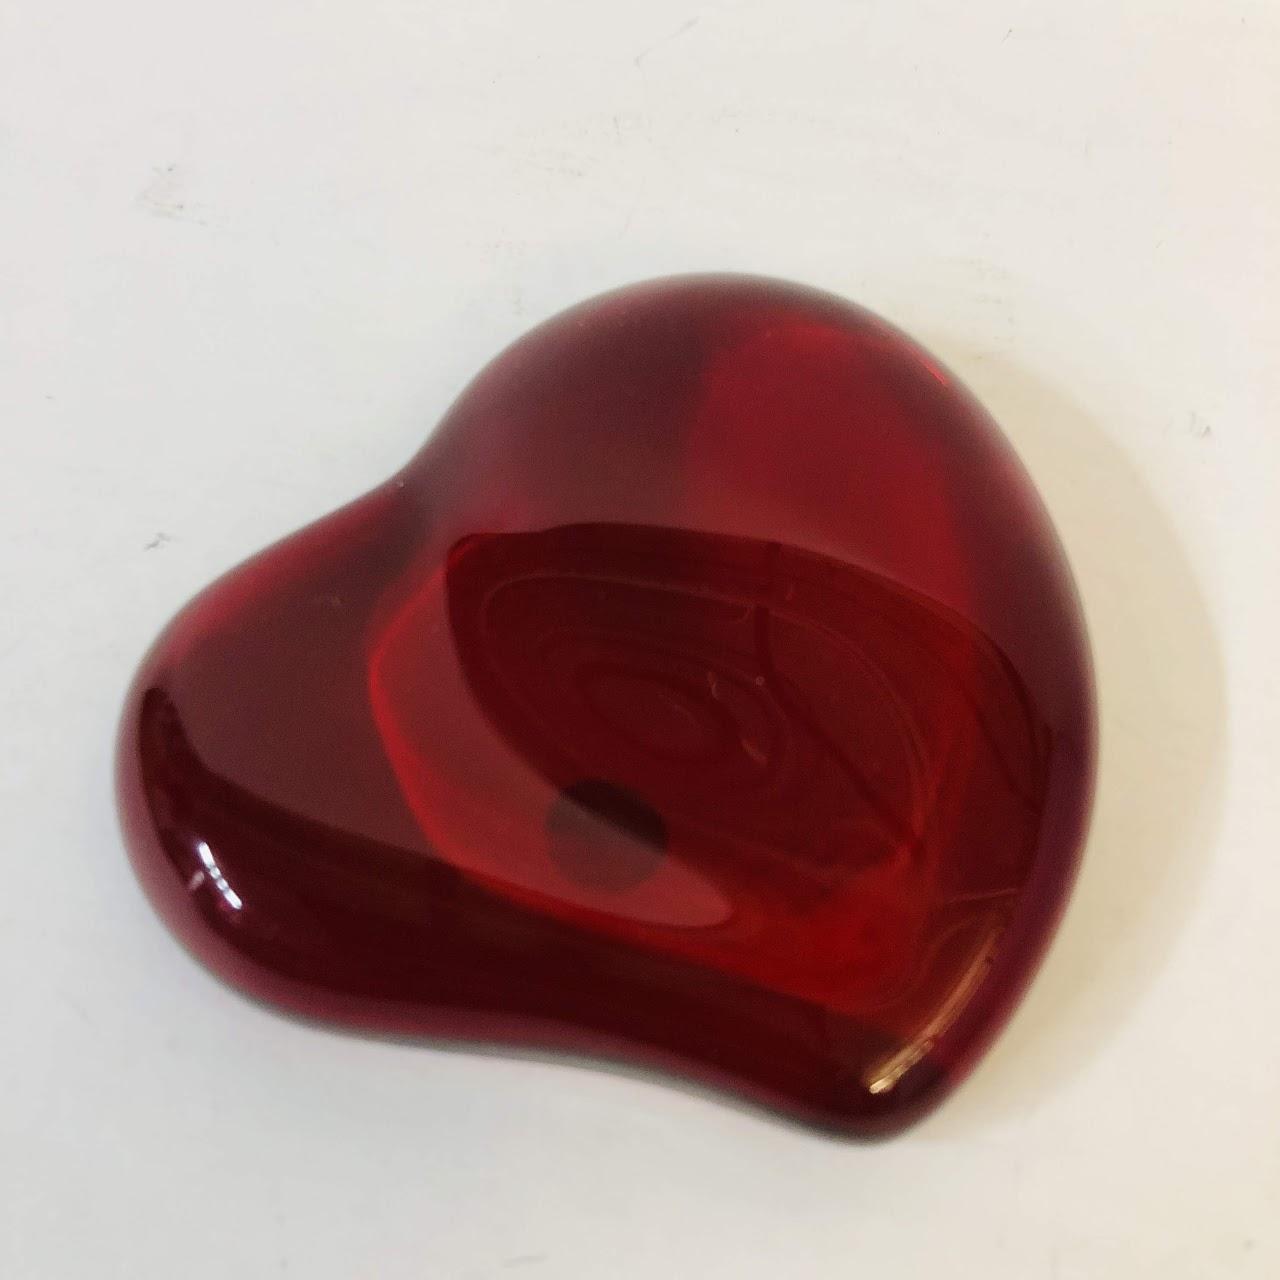 d40ca09f59d0 Tiffany & Co. X Elsa Peretti Heart Paperweight | Shophousingworks